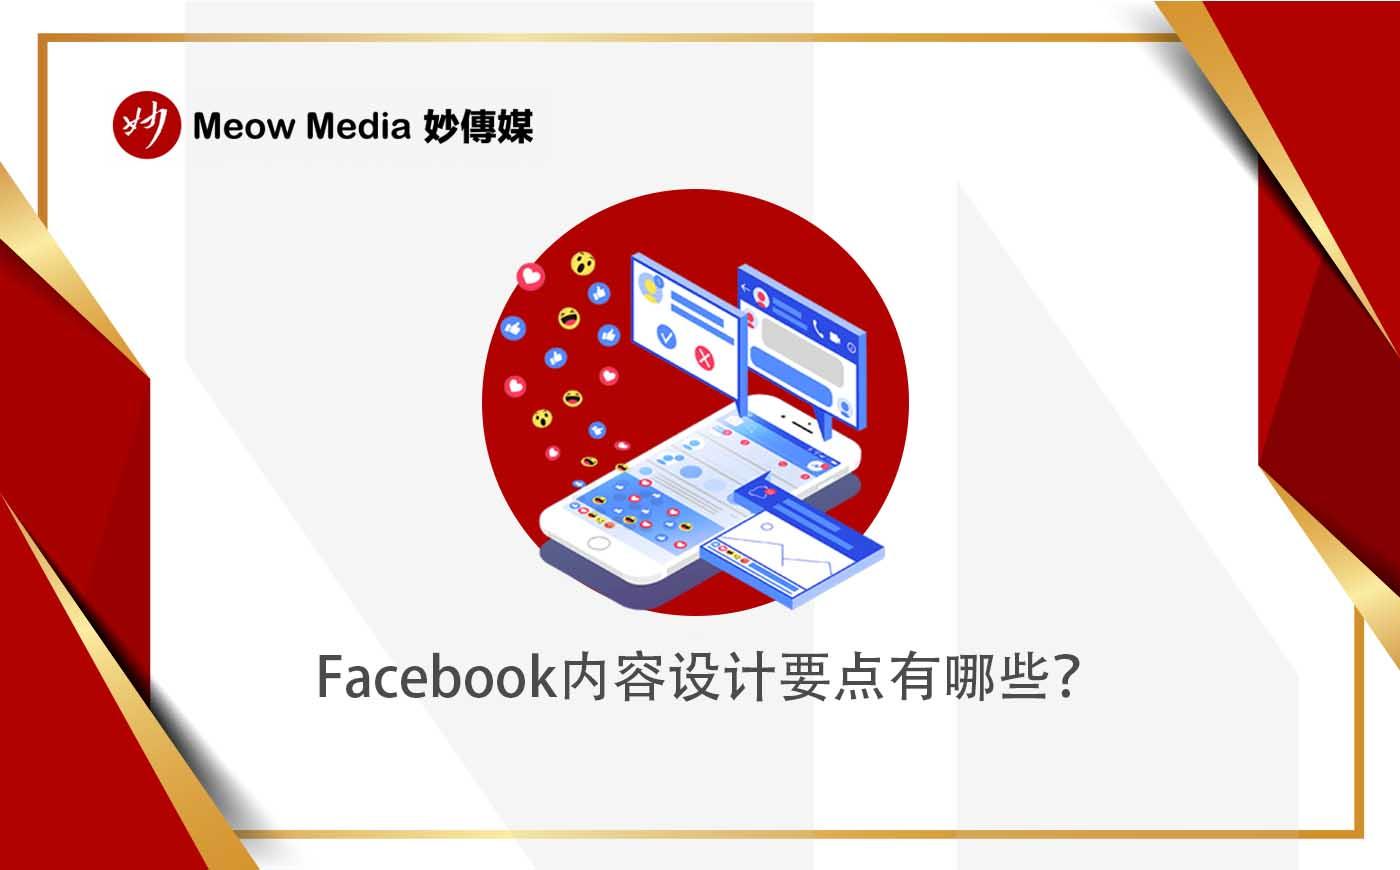 Facebook广告设计要点